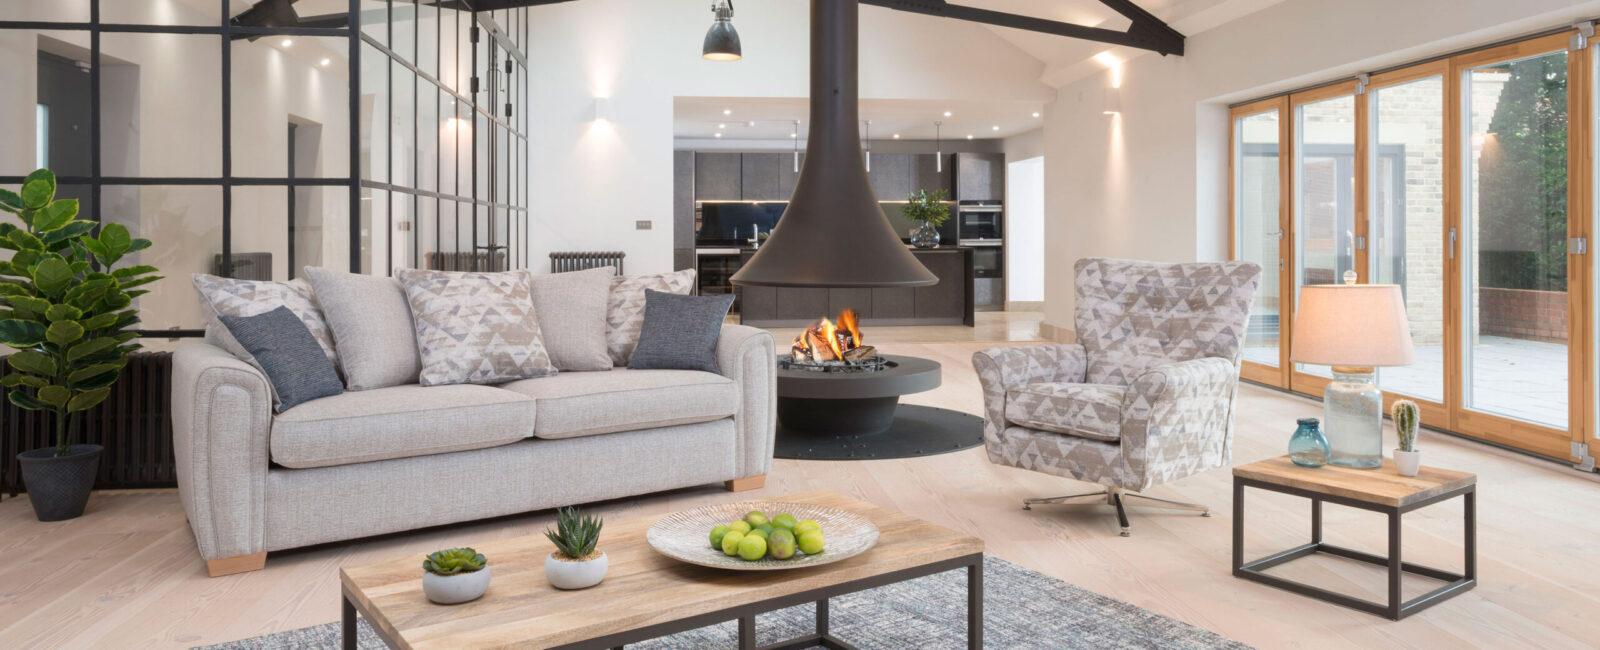 Memphis sofa and armchair